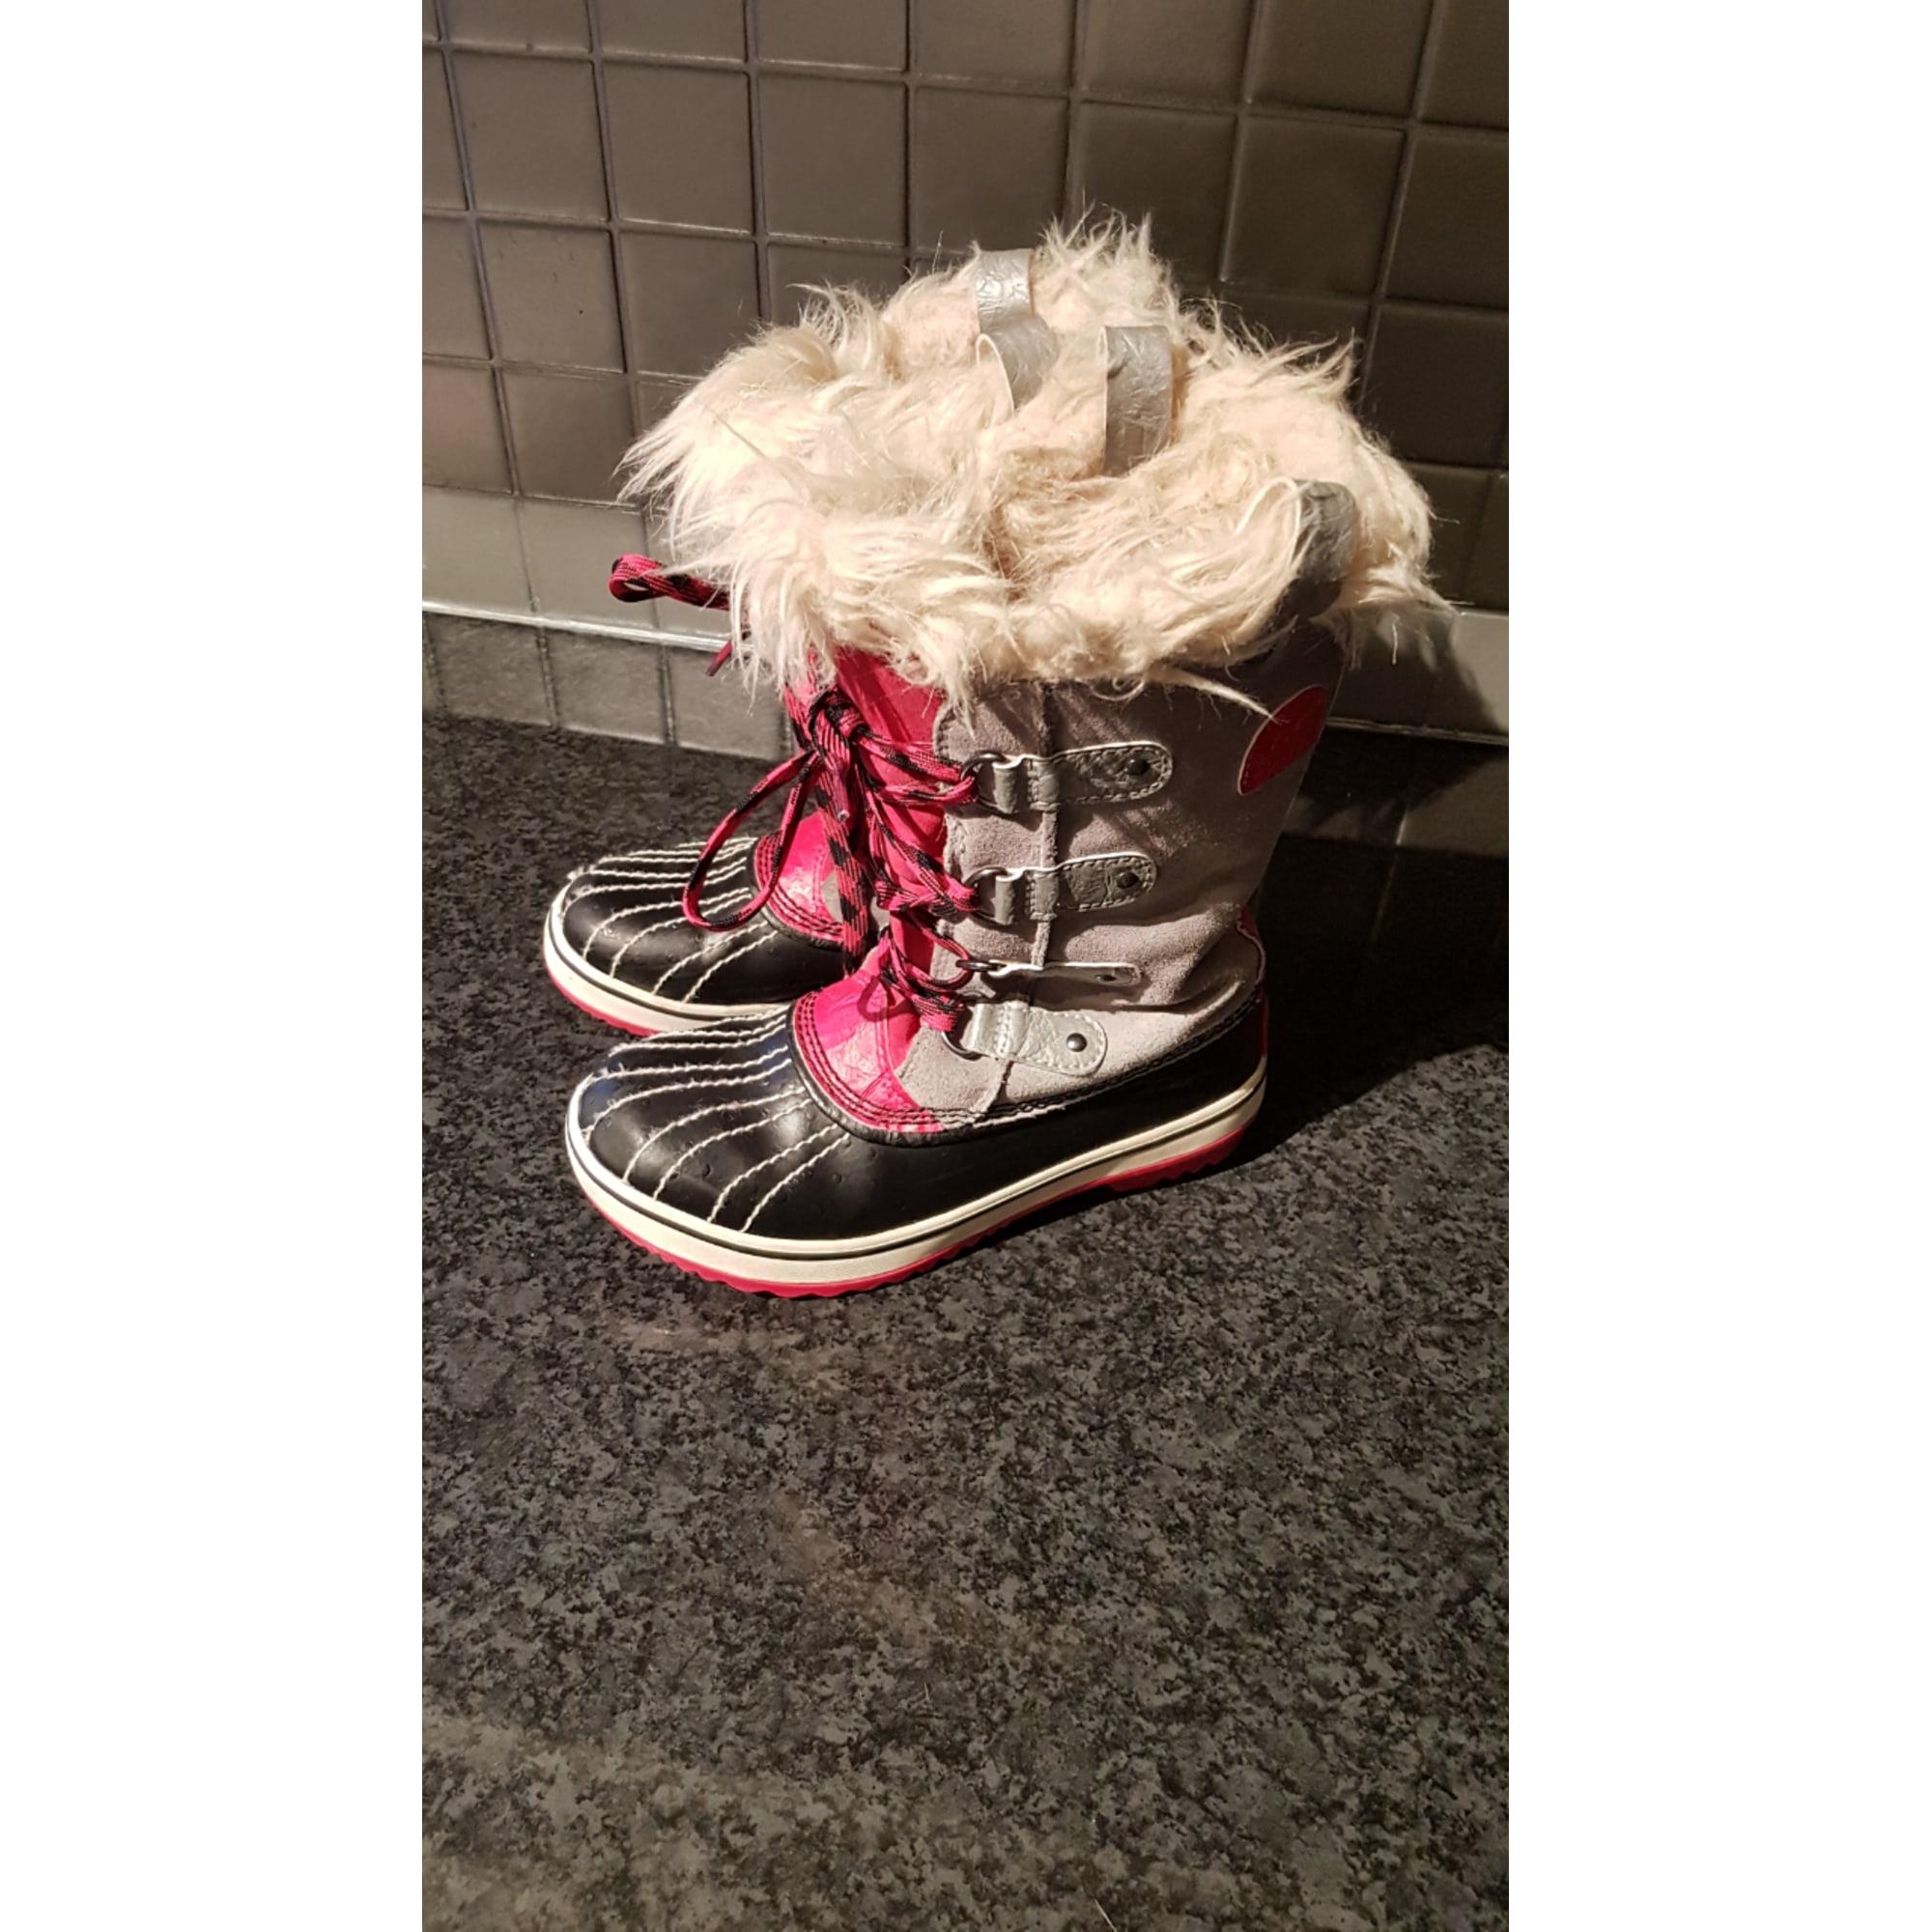 Bottes de neige SOREL cuir rose 33